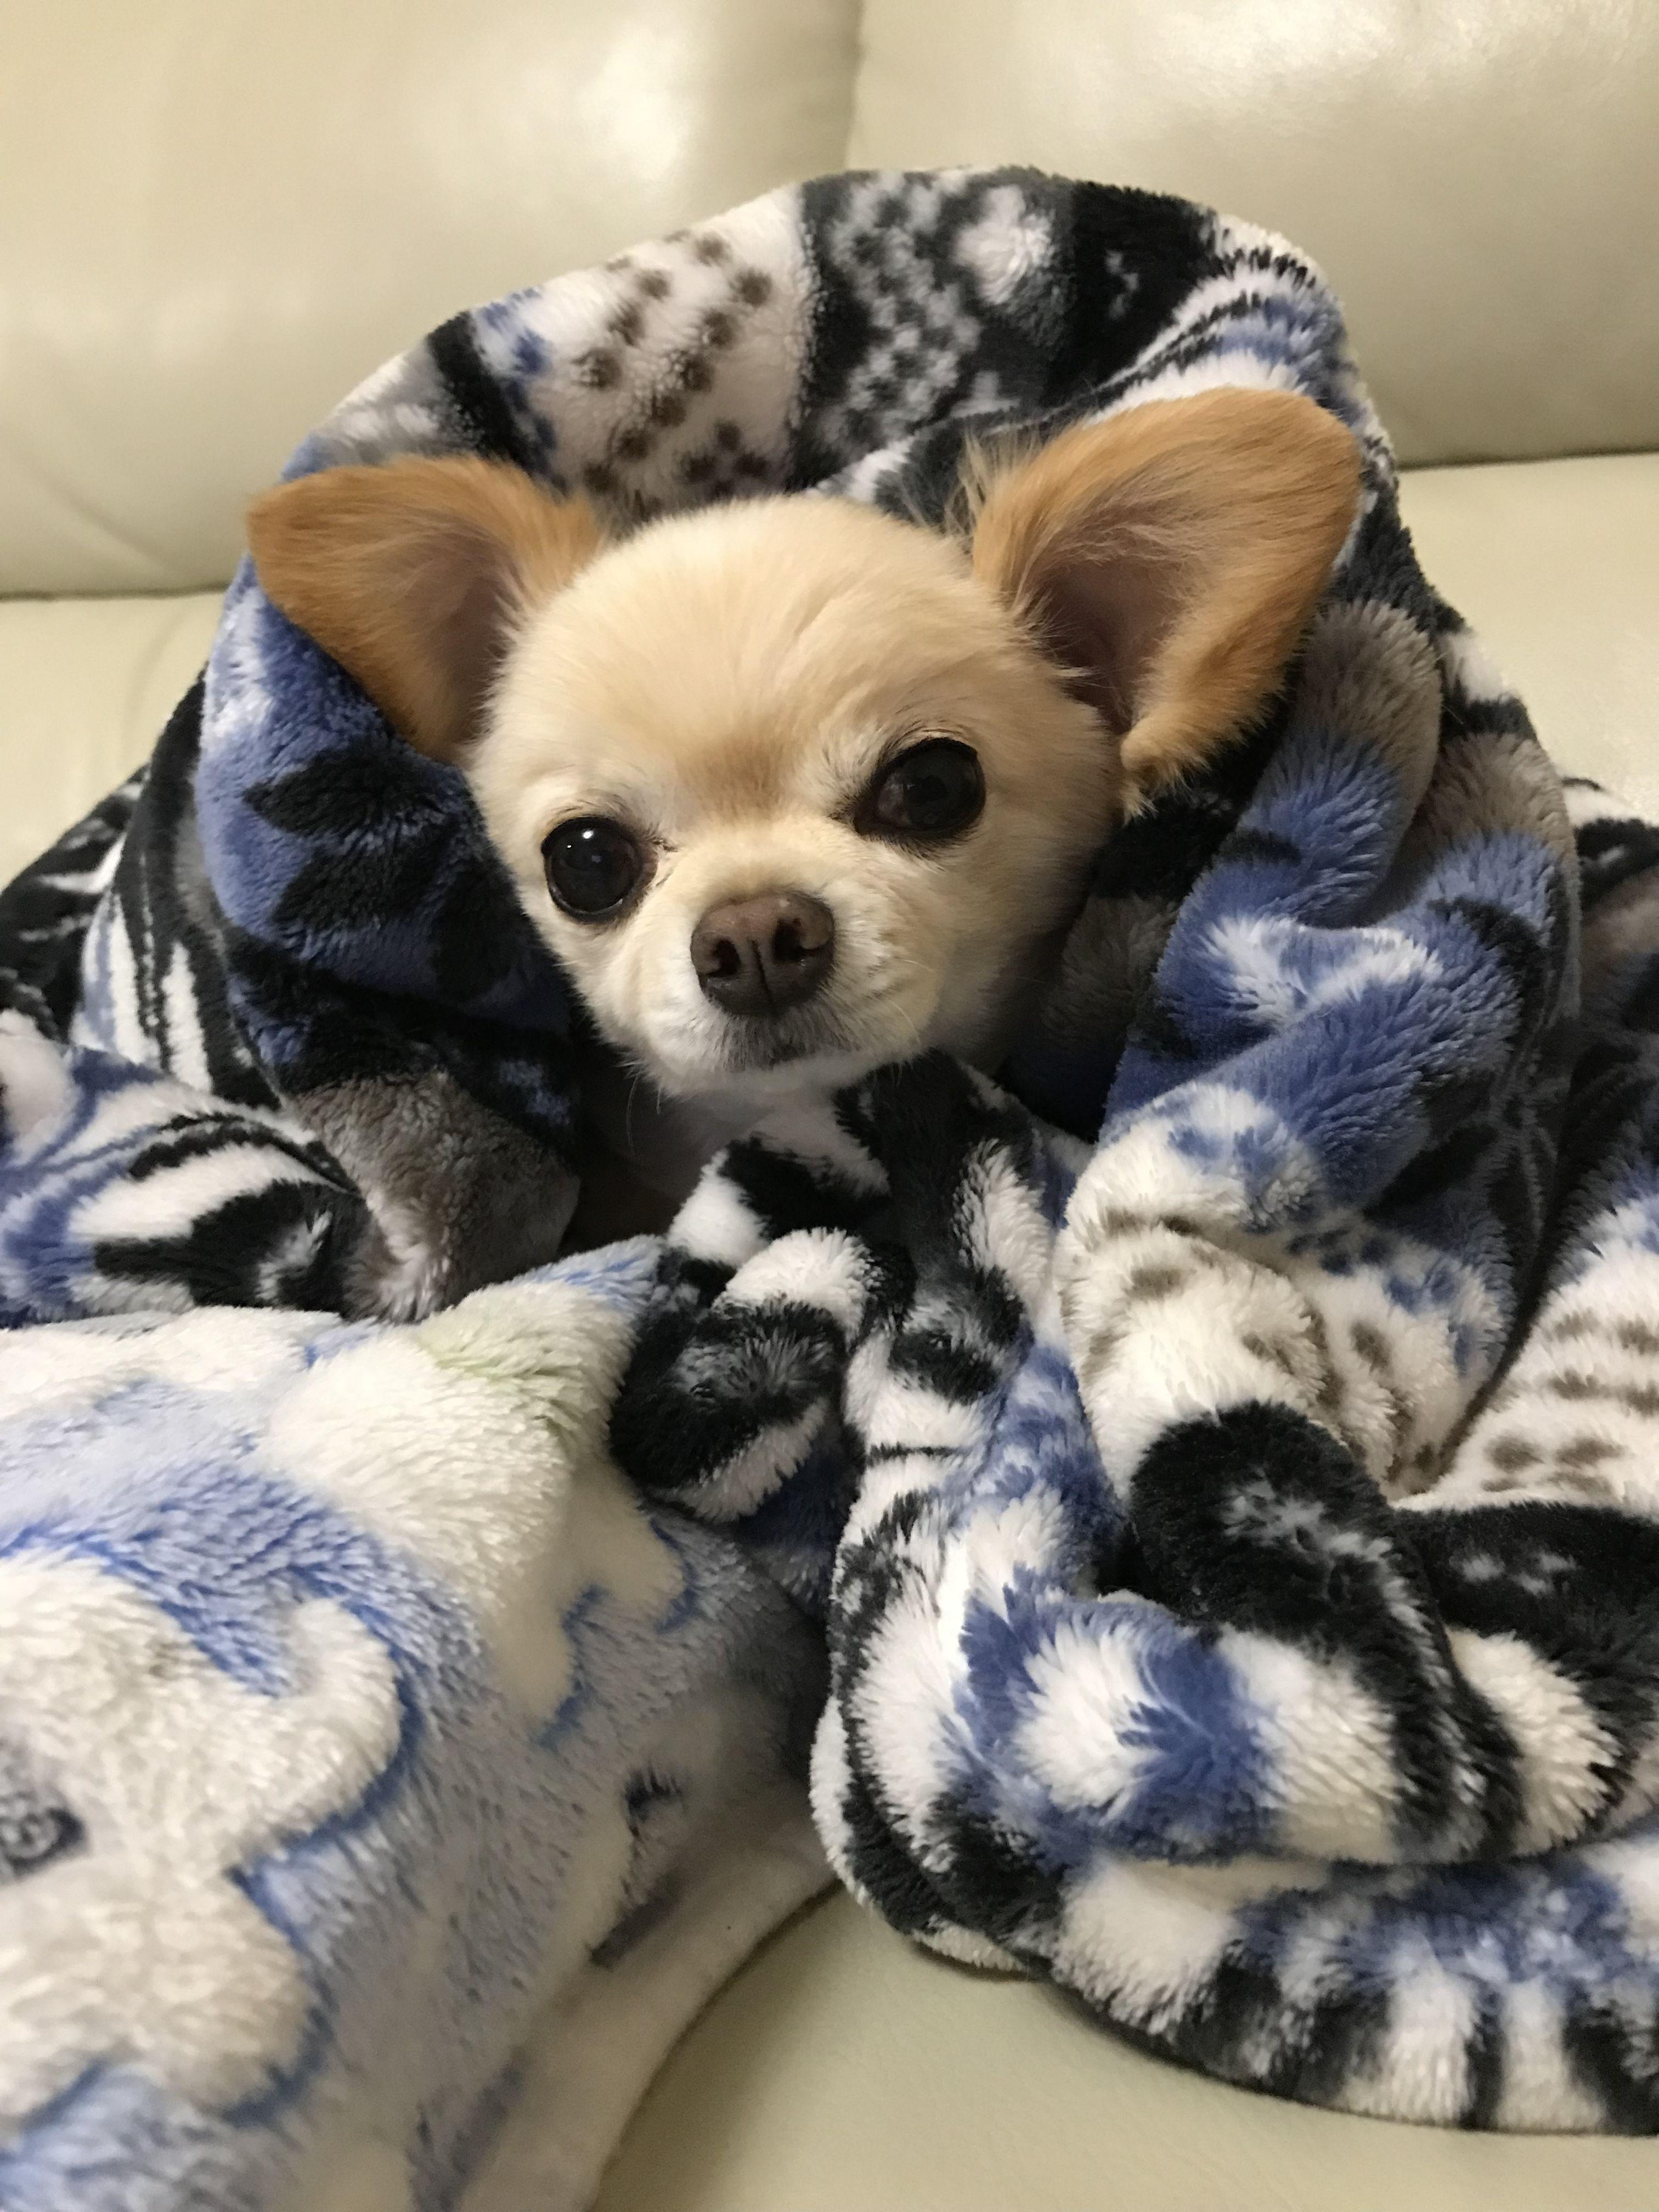 O Frio Ta Chegando Que Coisa Mais Linda Cute Chihuahua Chihuahua Puppies Chihuahua Dogs